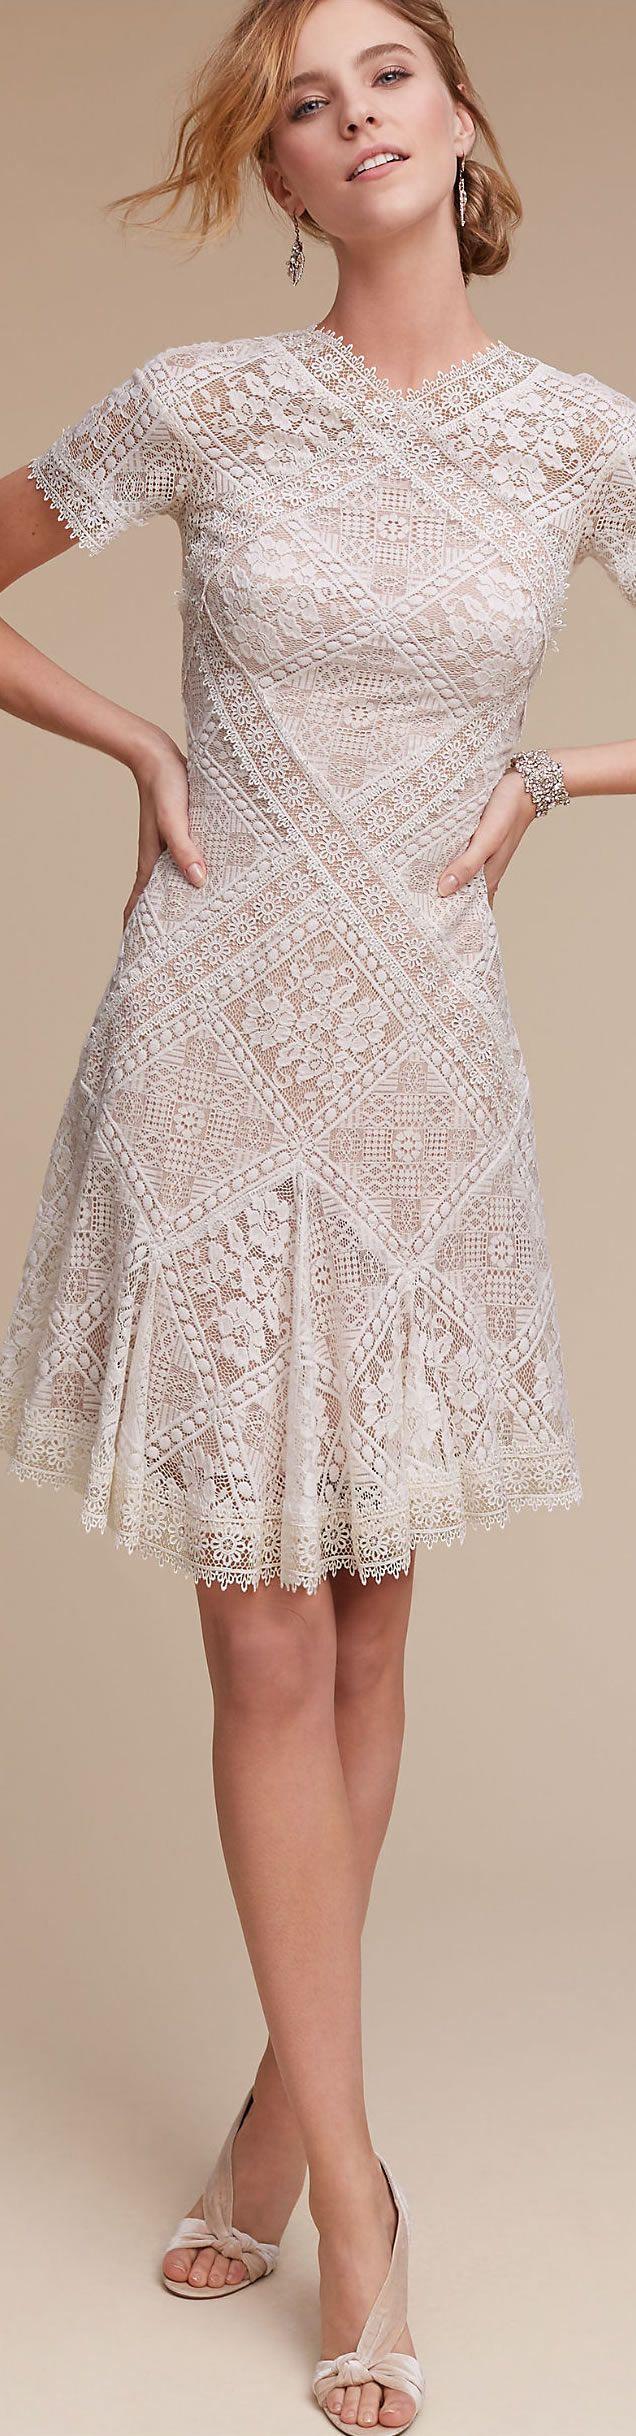 Hudson Graphic Lace Dress